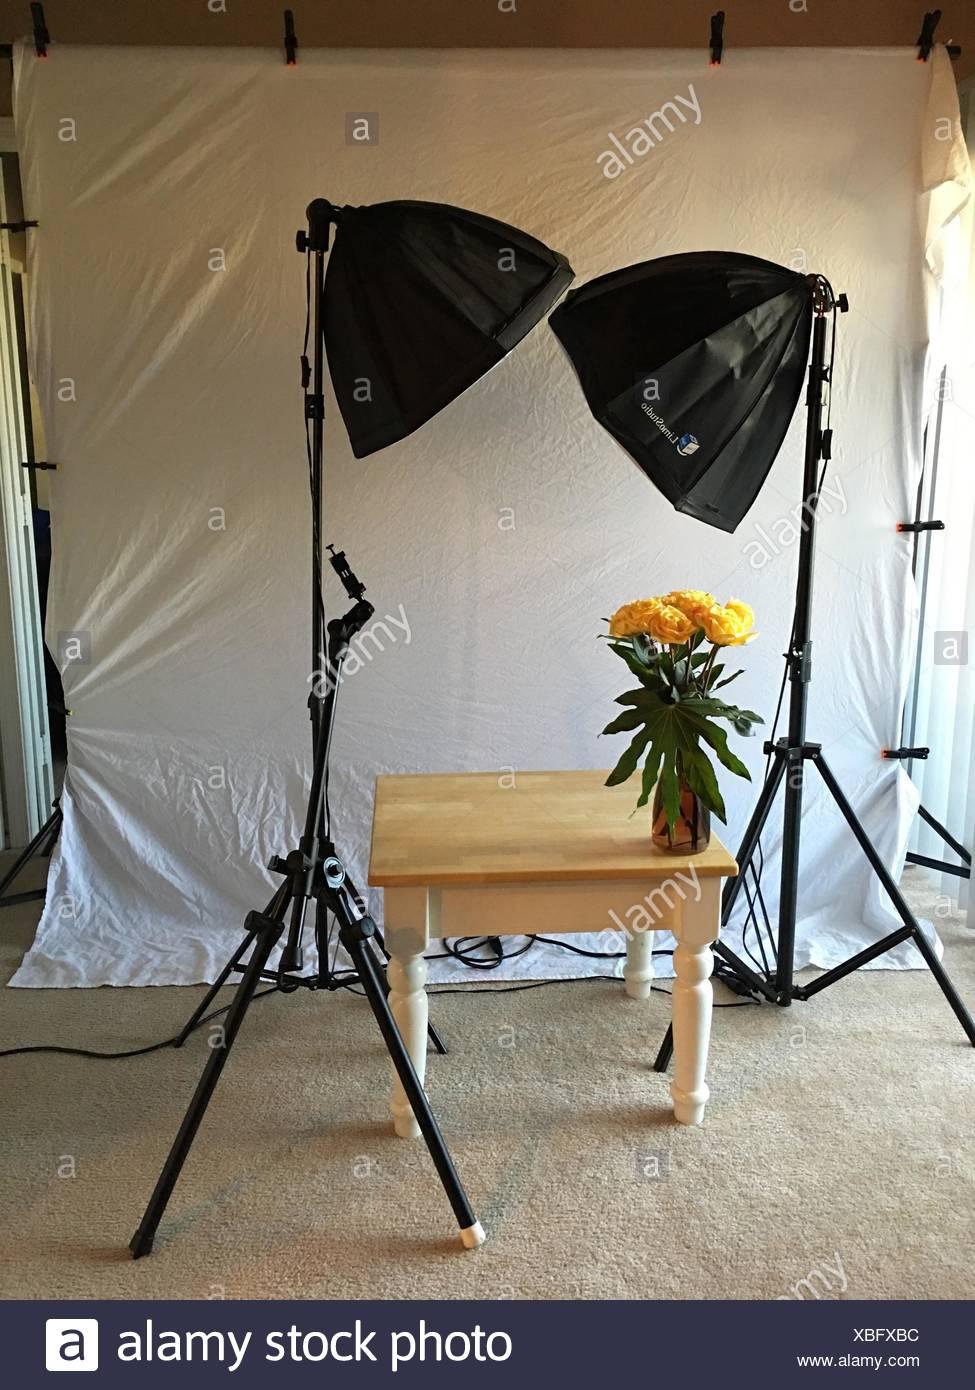 Flower Vase On Table At Photo Studio - Stock Image